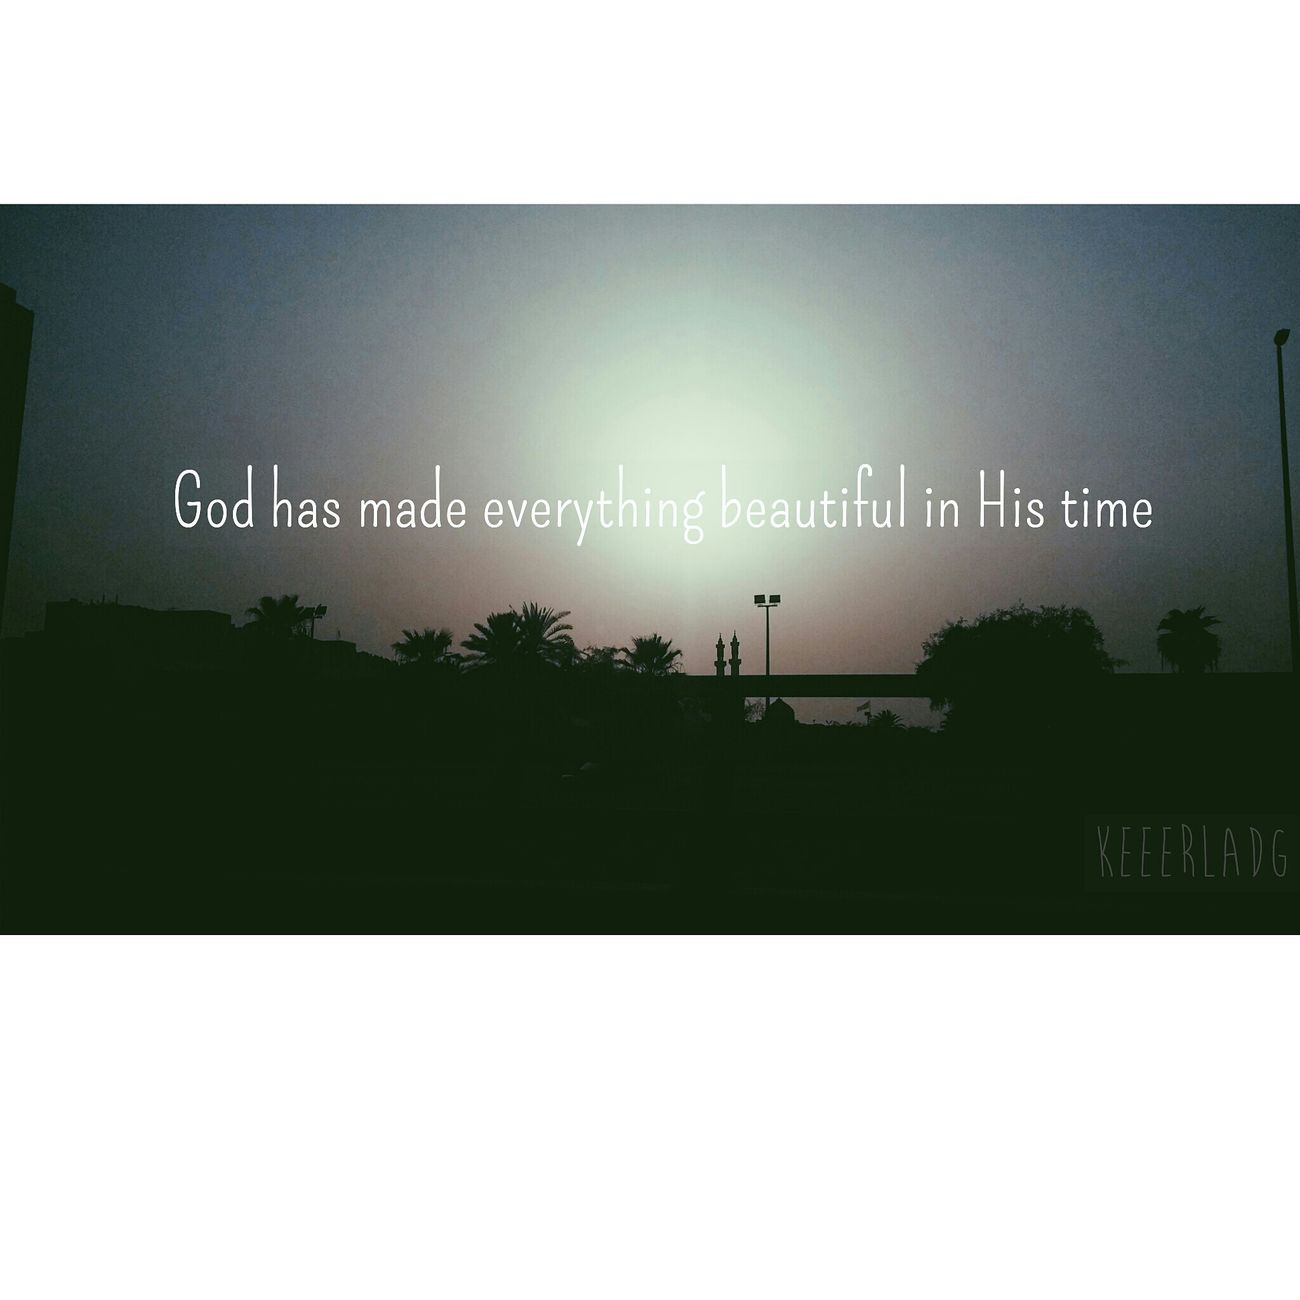 In God's perfect time KeeerlaDG Kapturegraphy Kapture EyeEm Nature Lover EyeEm Best Shots